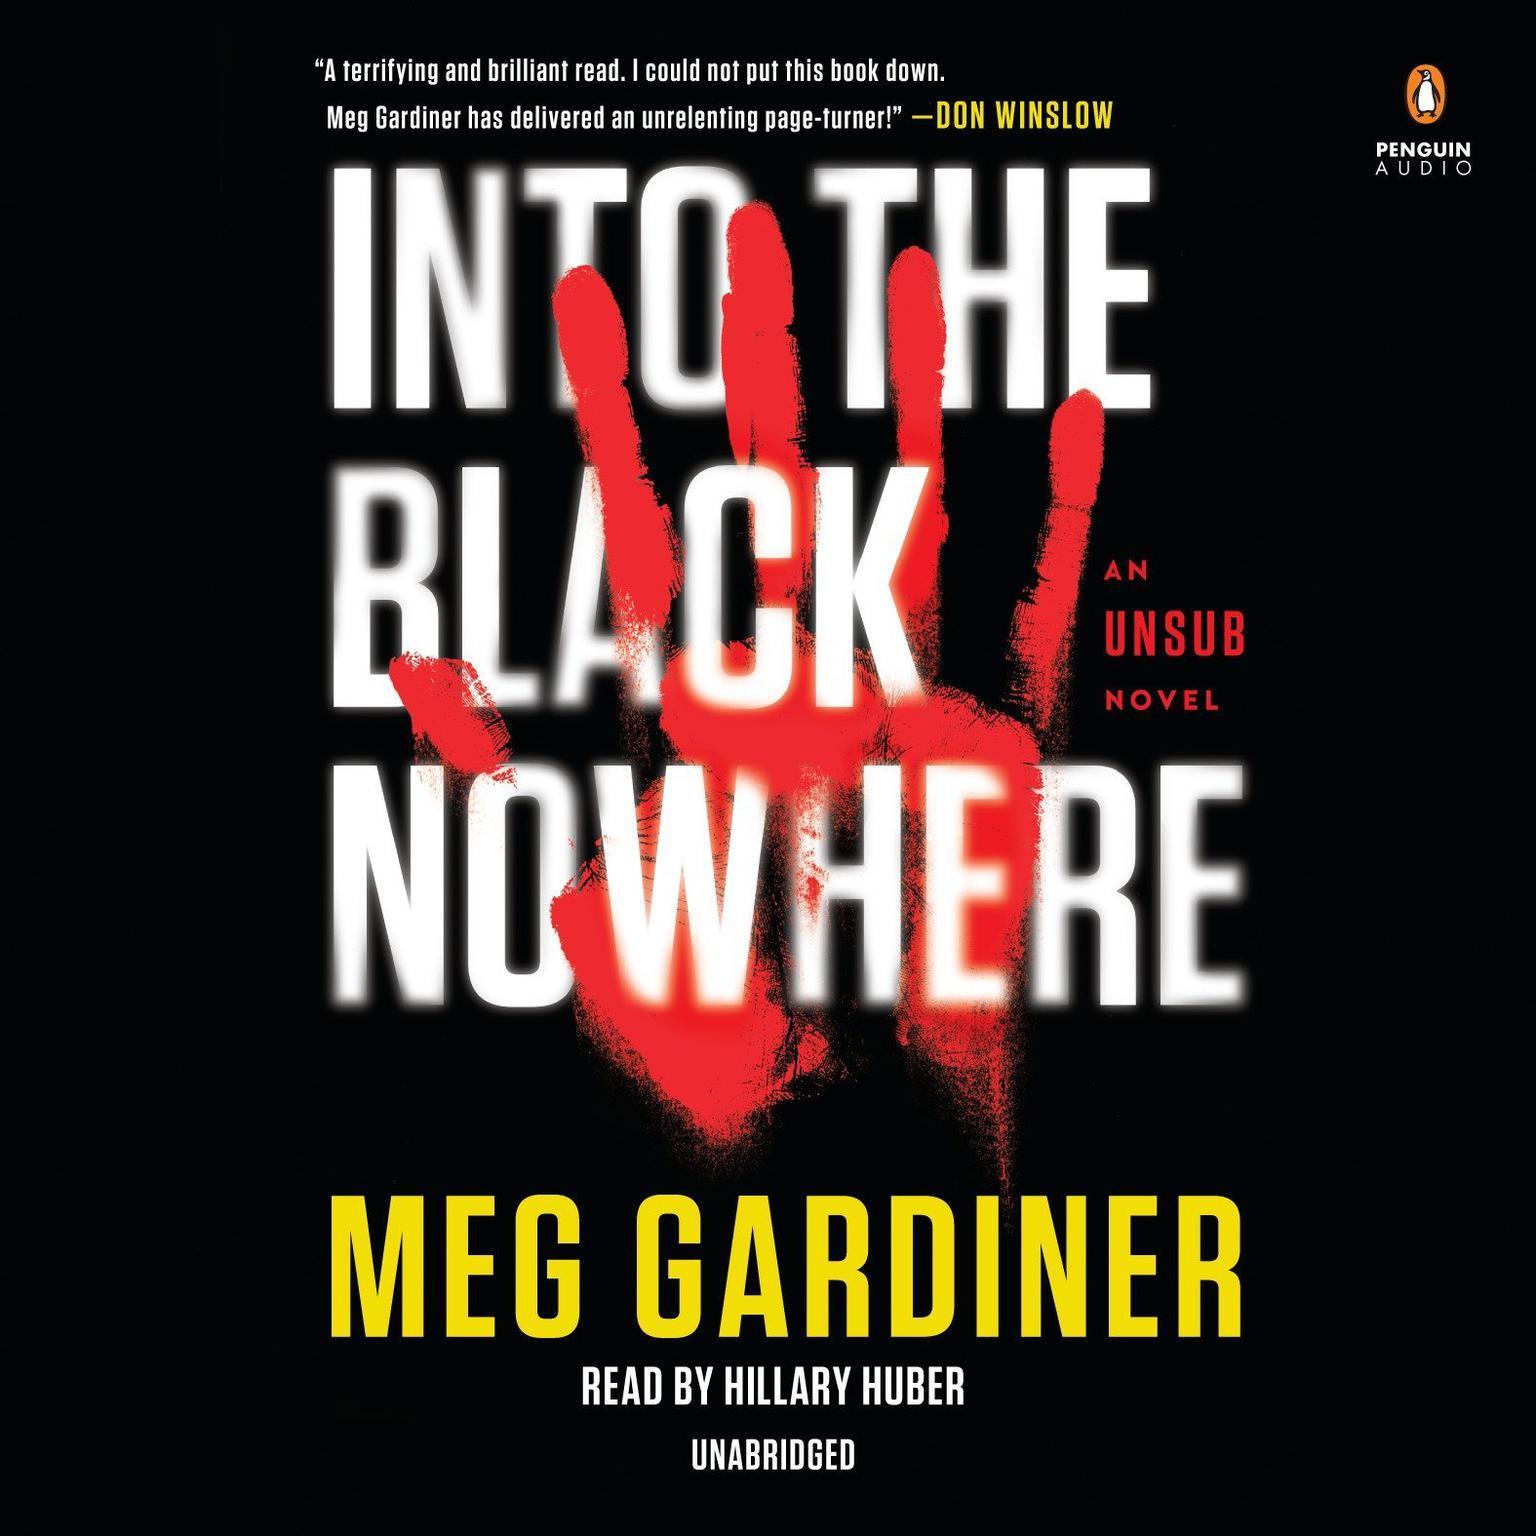 Into the Black Nowhere: An UNSUB Novel Audiobook, by Meg Gardiner